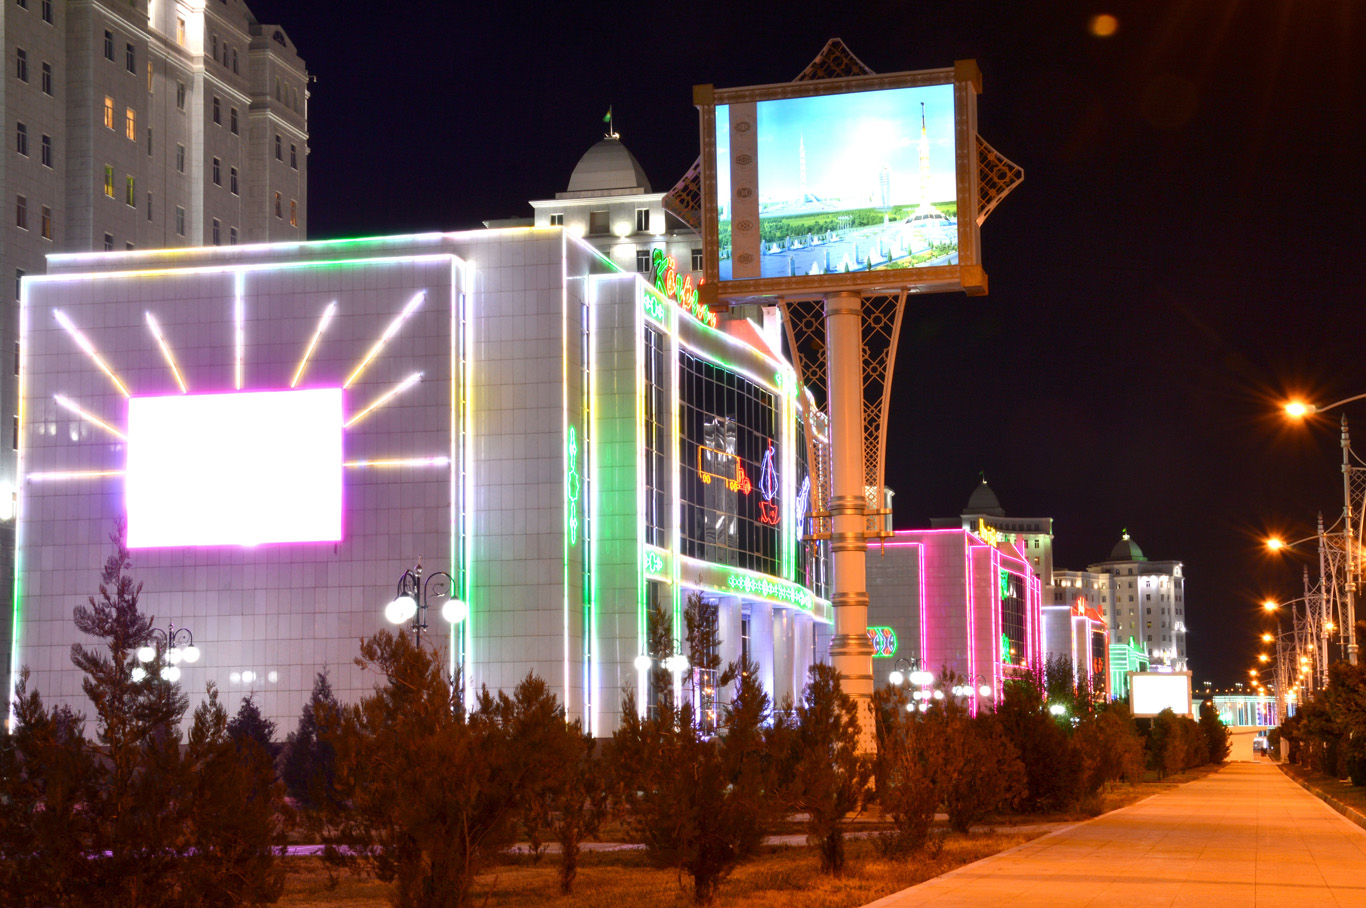 Downtown Ashgabat illuminated at night